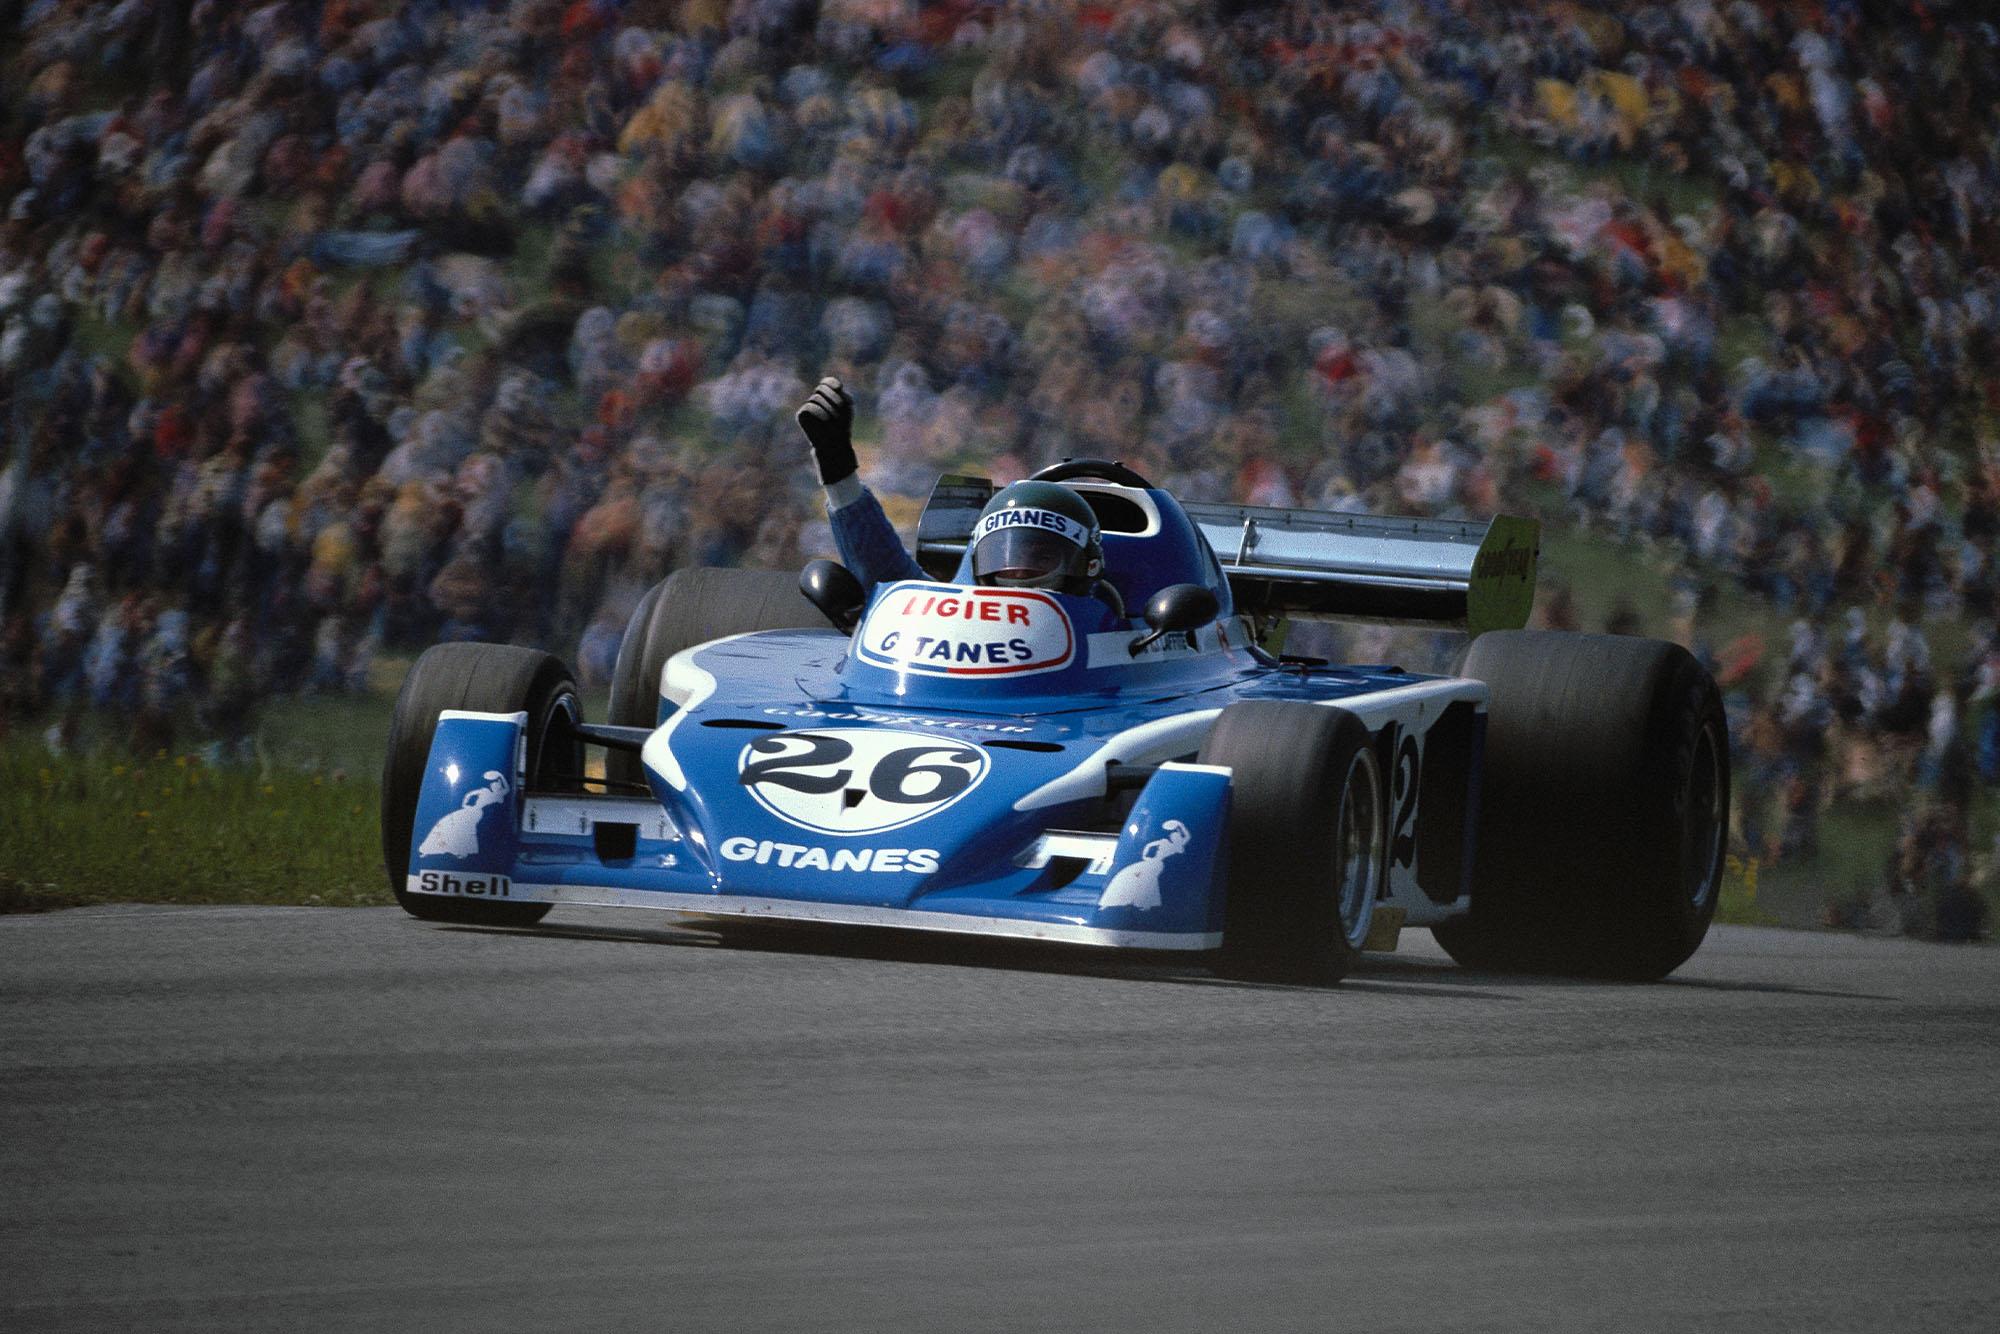 Jacques Laffite (Ligier) at the 1976 Austrian Grand Prix, Österreichring.